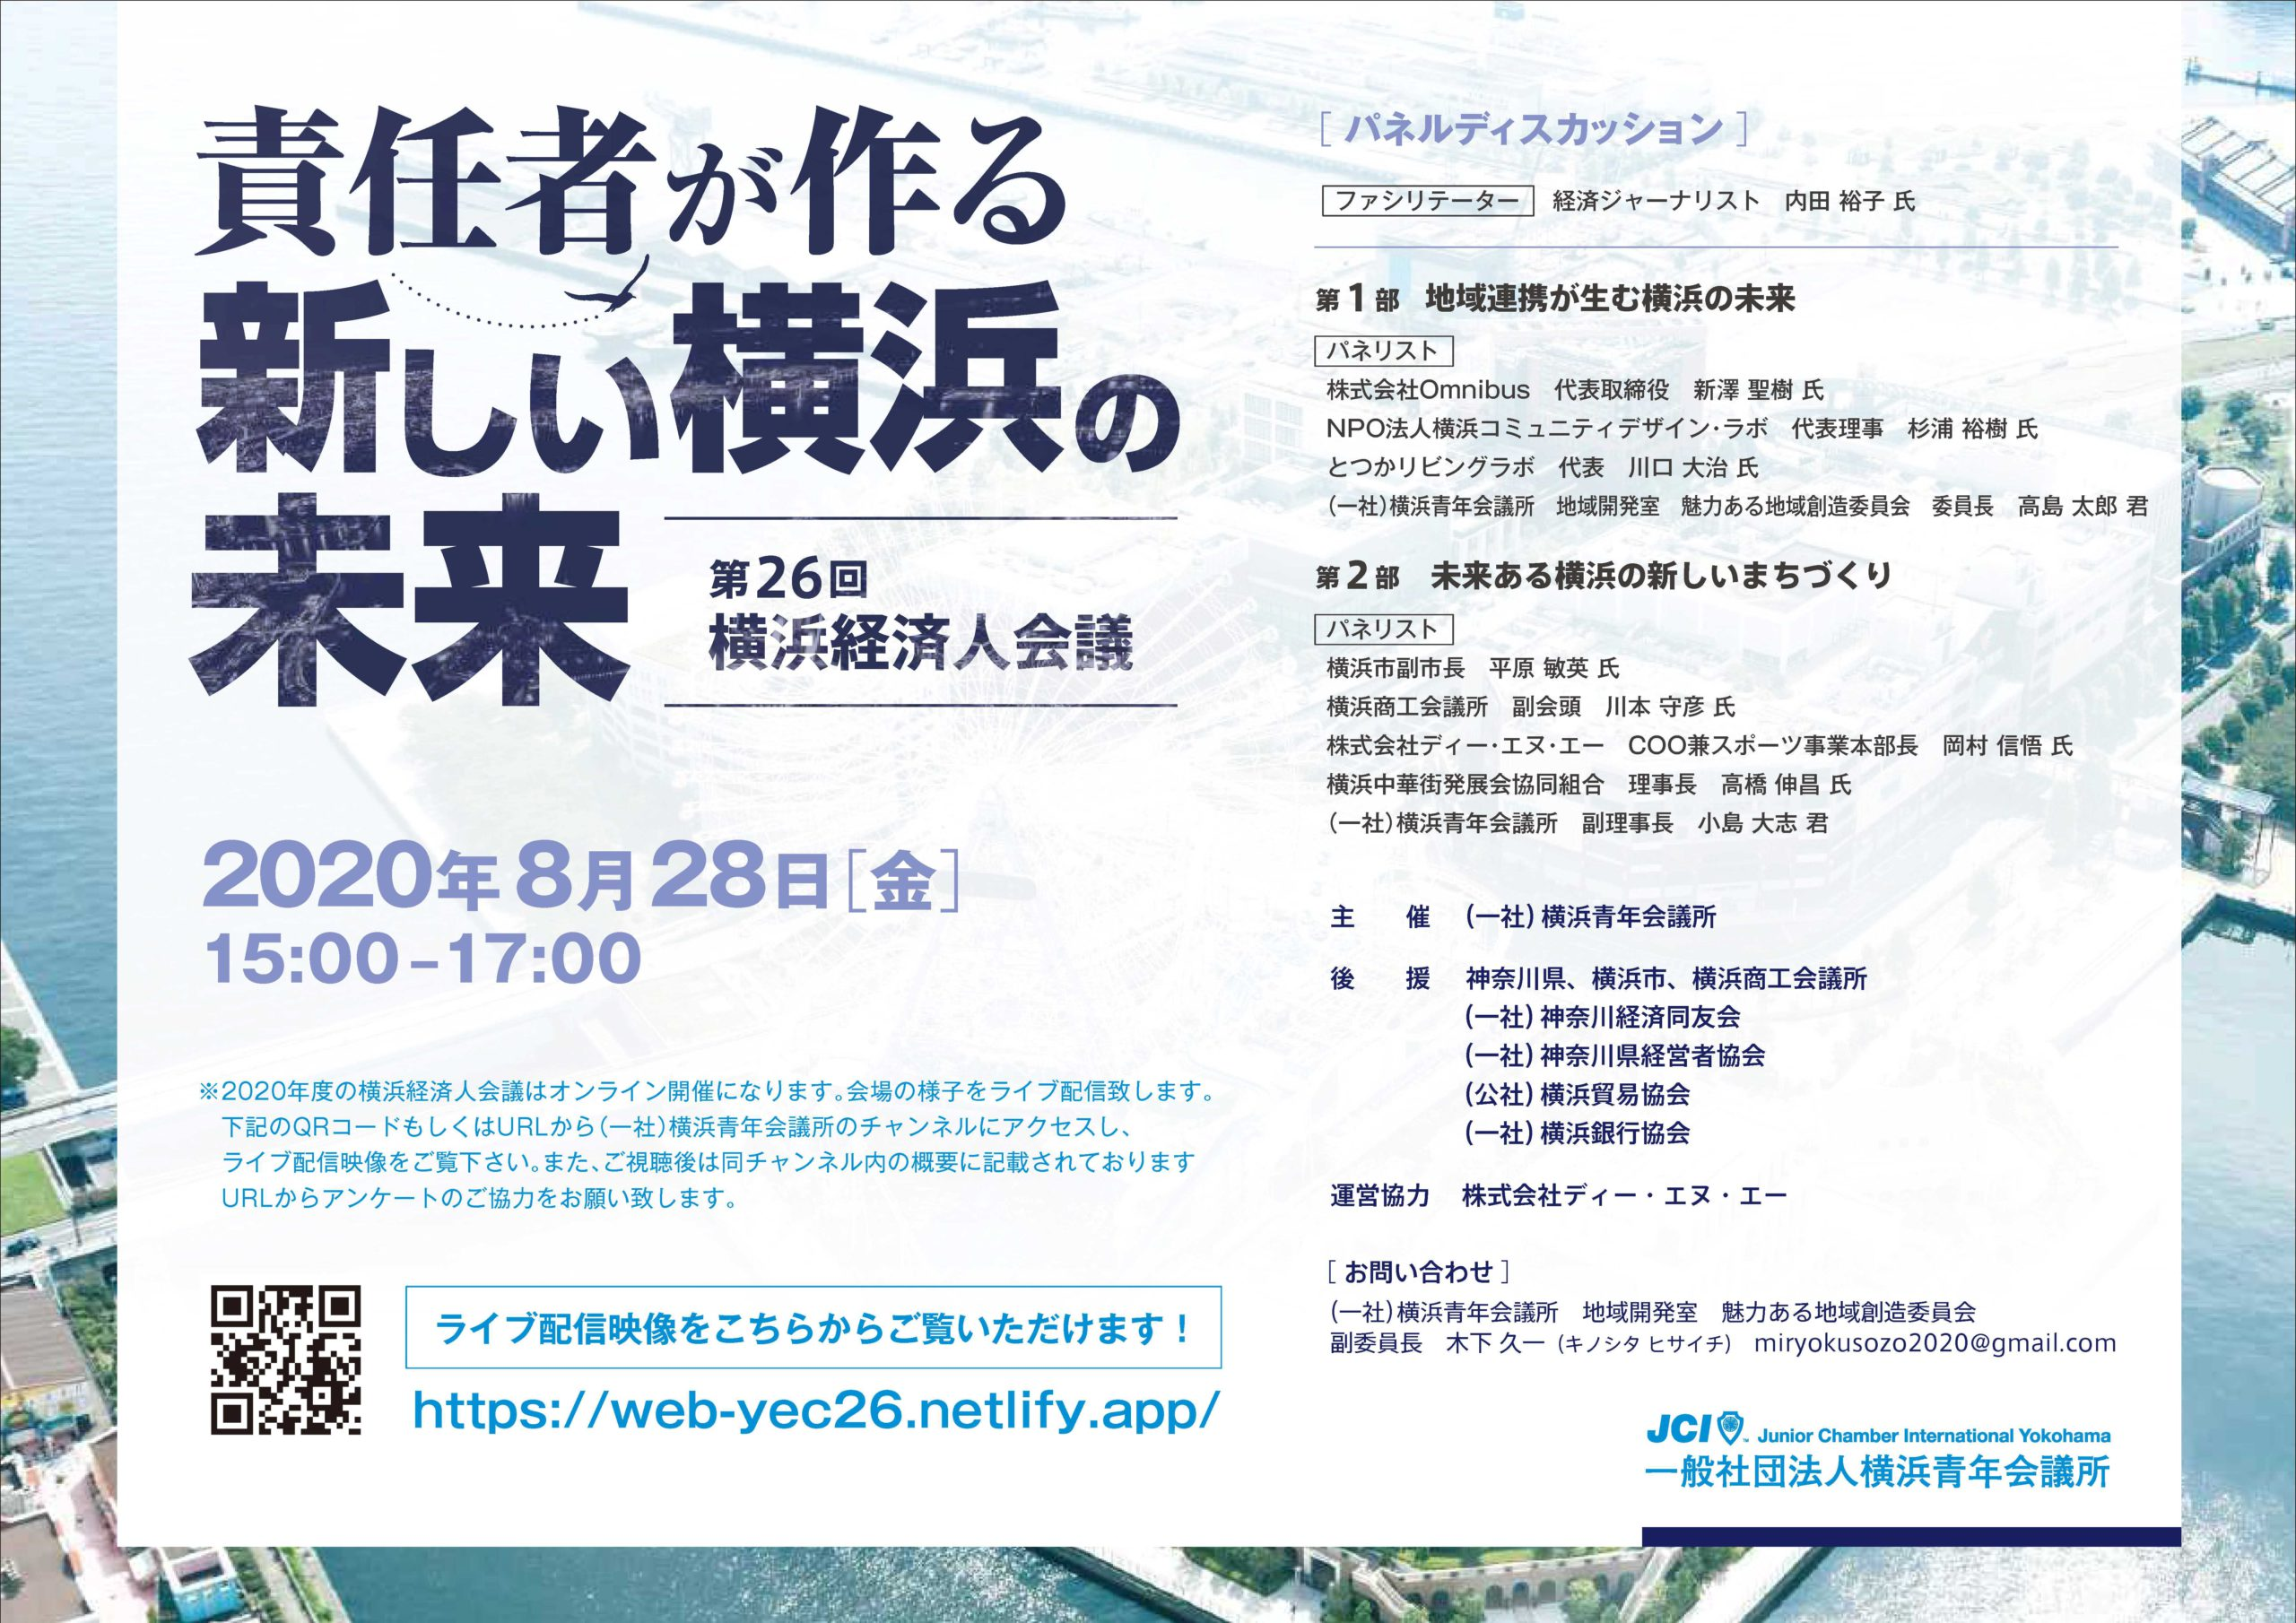 第26回横浜経済人会議開催のお知らせ – 一般社団法人横浜青年会議所